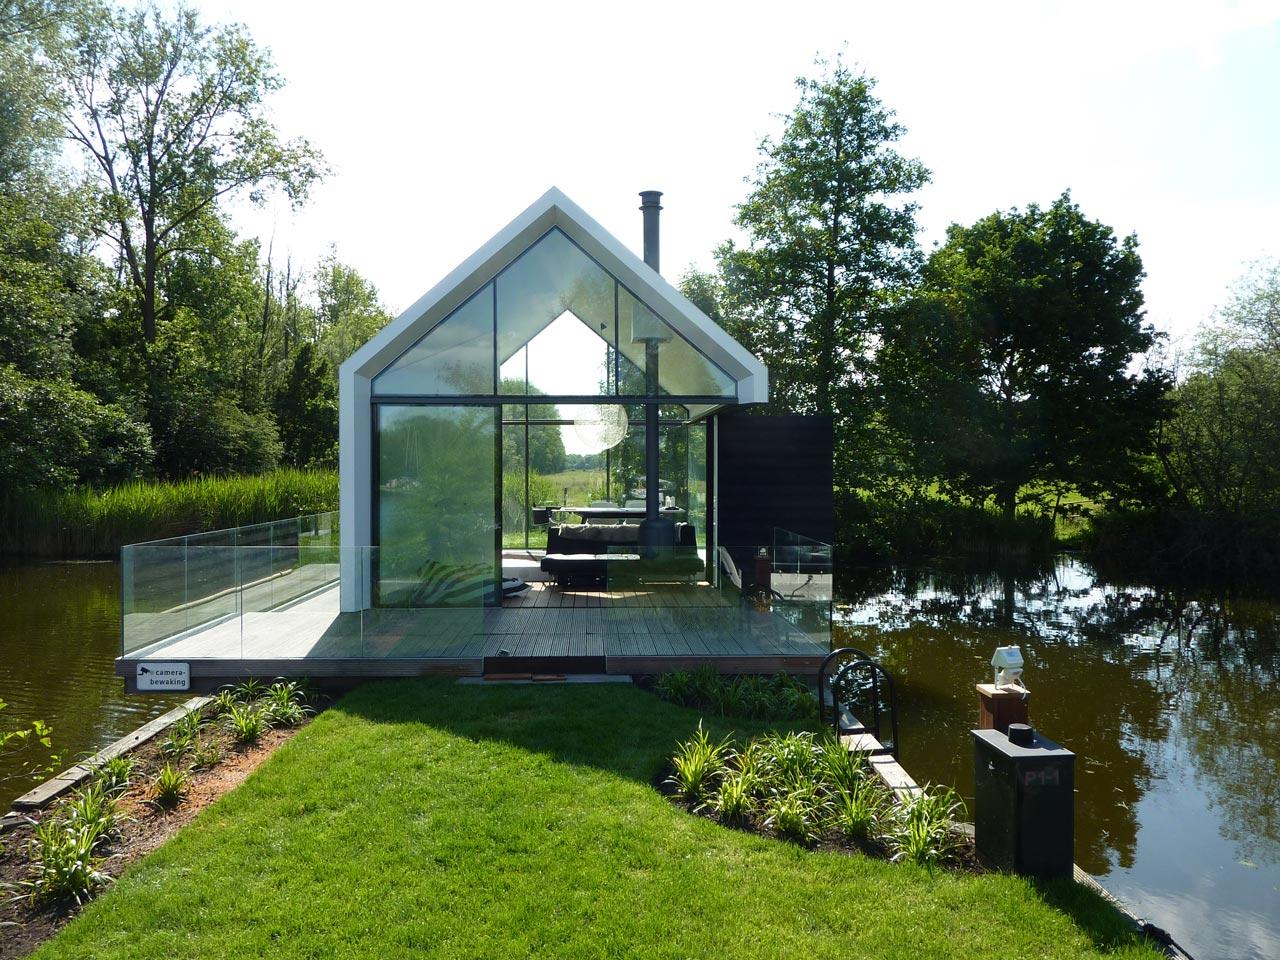 Zomerhuis-Eiland huis op HGTV nl